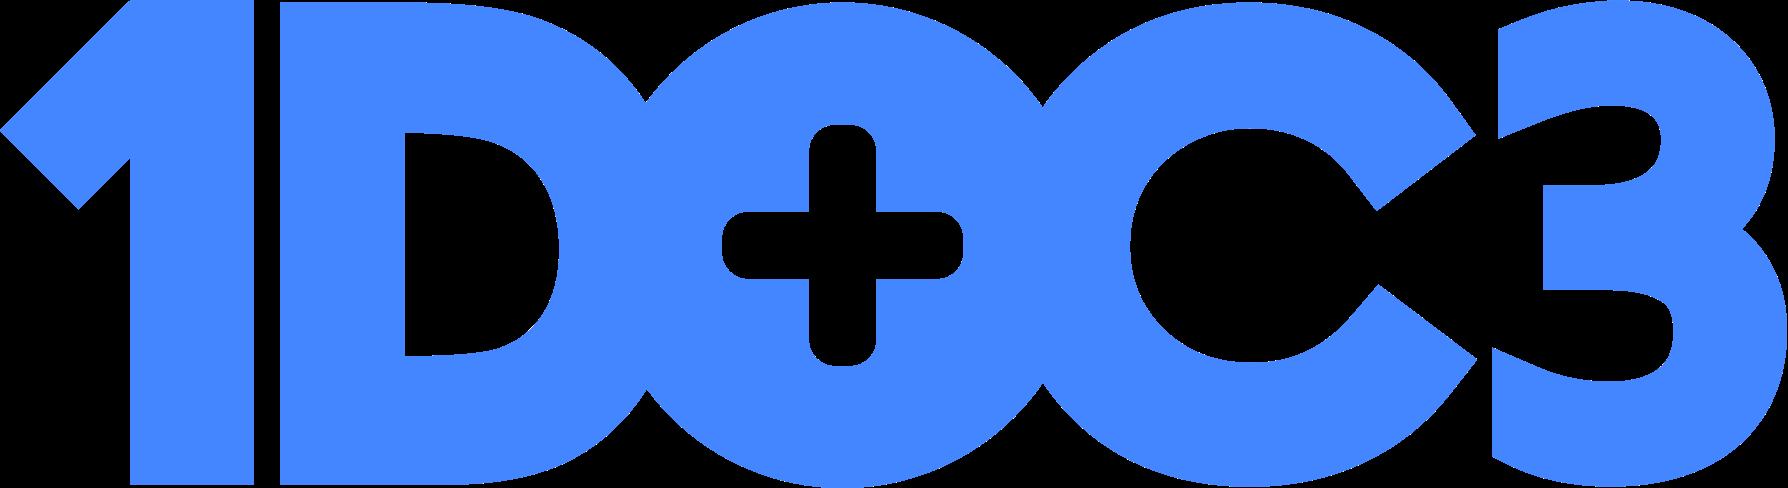 Logo 1doc3 azul